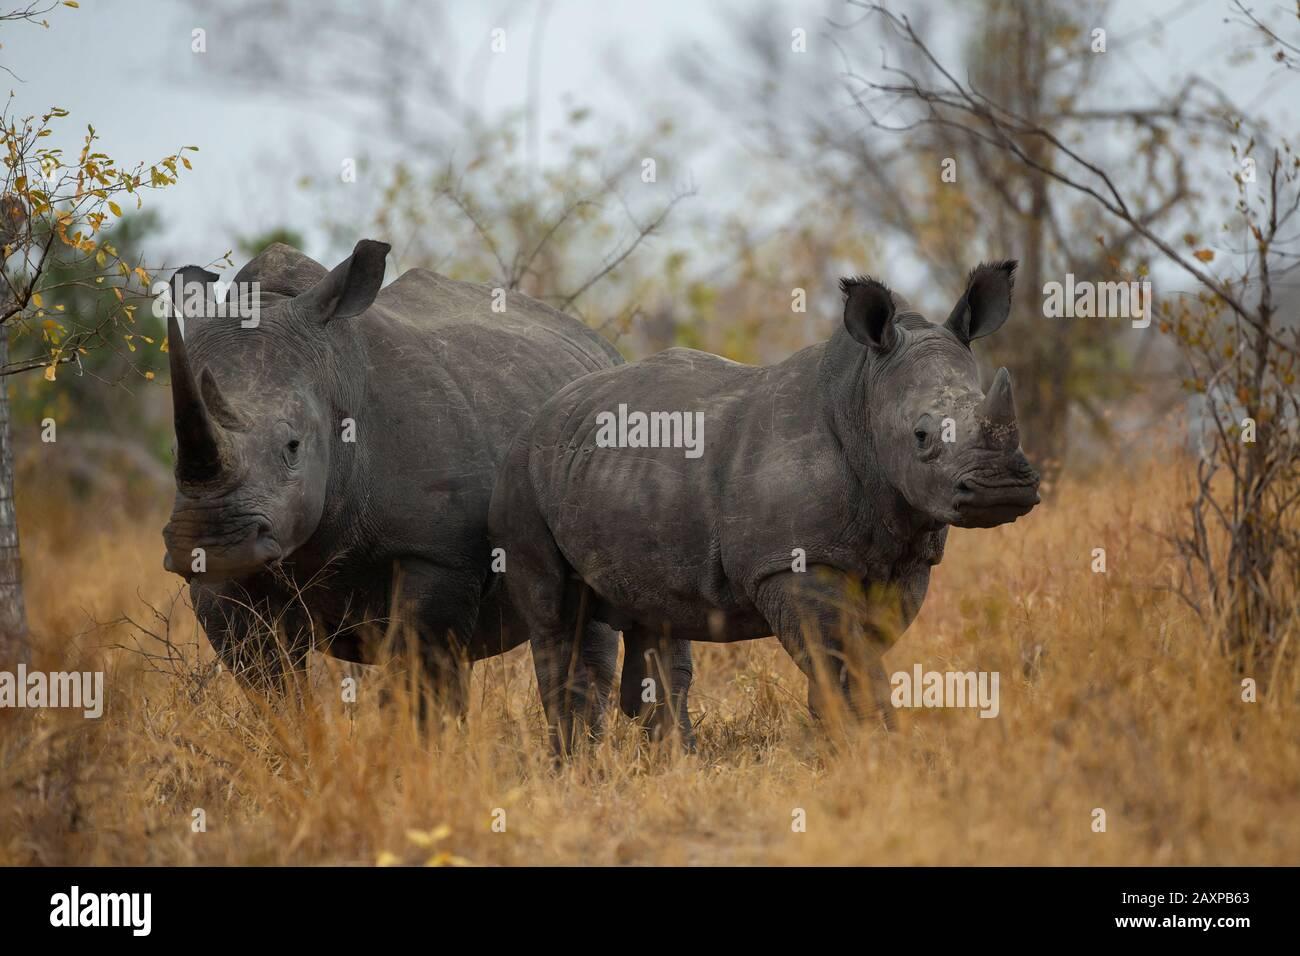 The southern white rhinoceros or southern square-lipped rhinoceros (Ceratotherium simum simum) Stock Photo